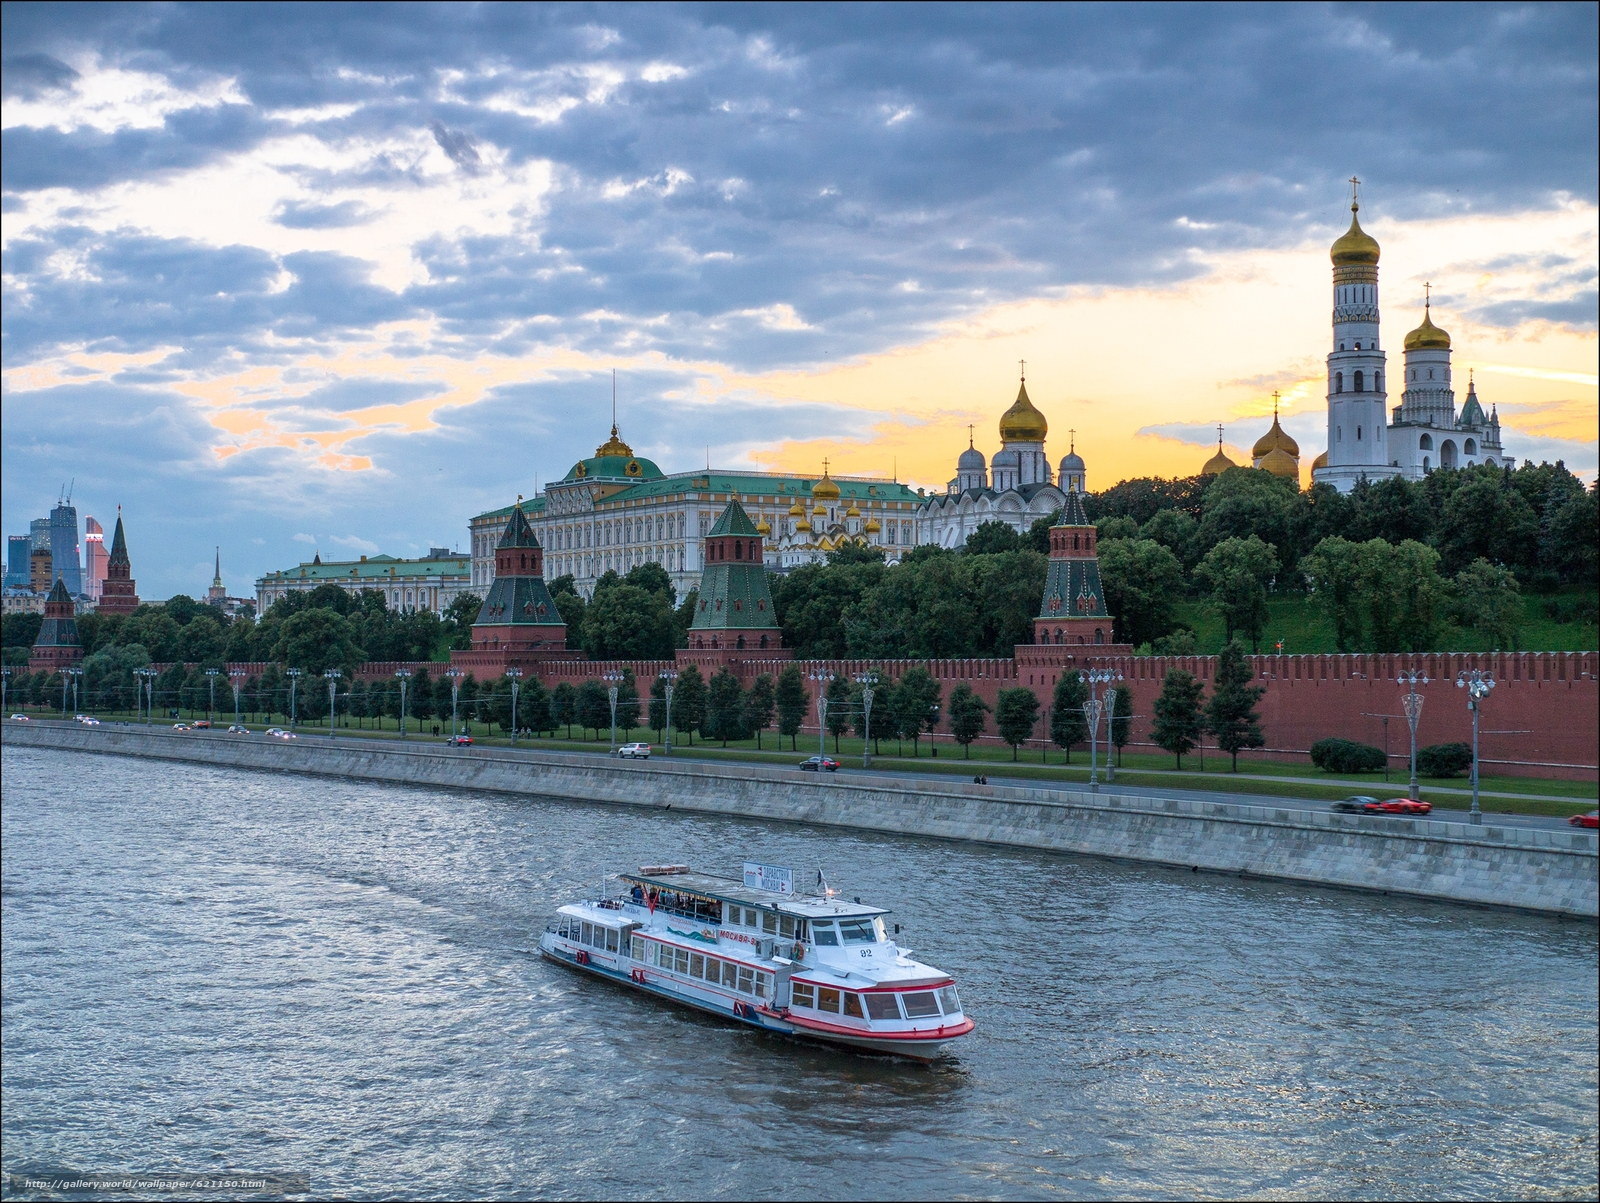 Russia, Moscow, Kremlin, Москва, кремль, Россия